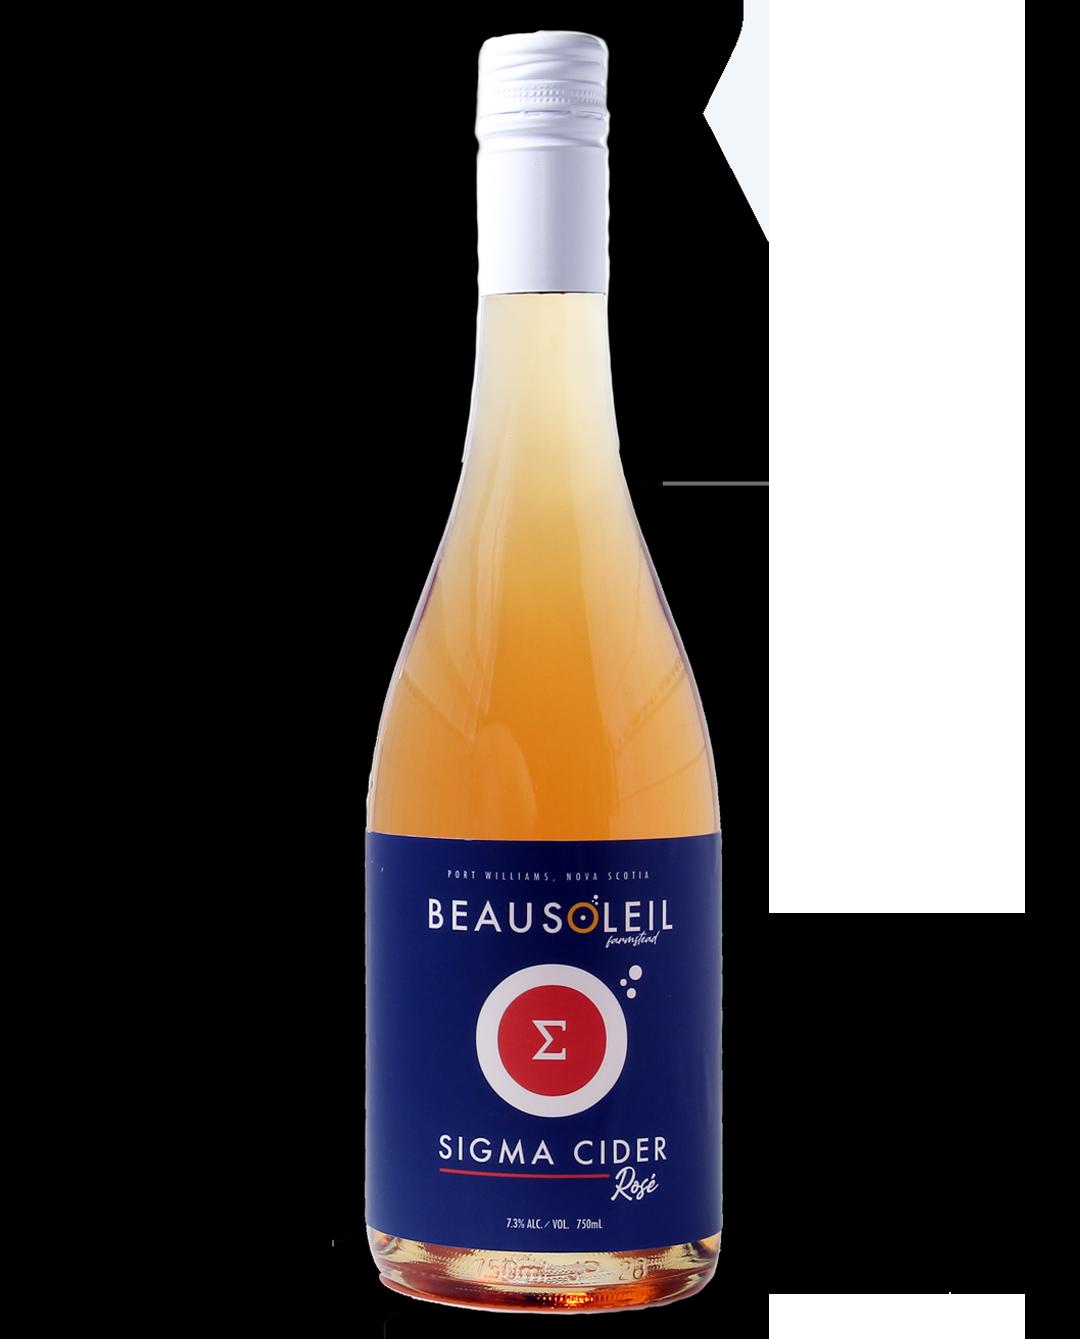 Photo: Bottle of Beausoleil Farmstead Sigma Cider Rose